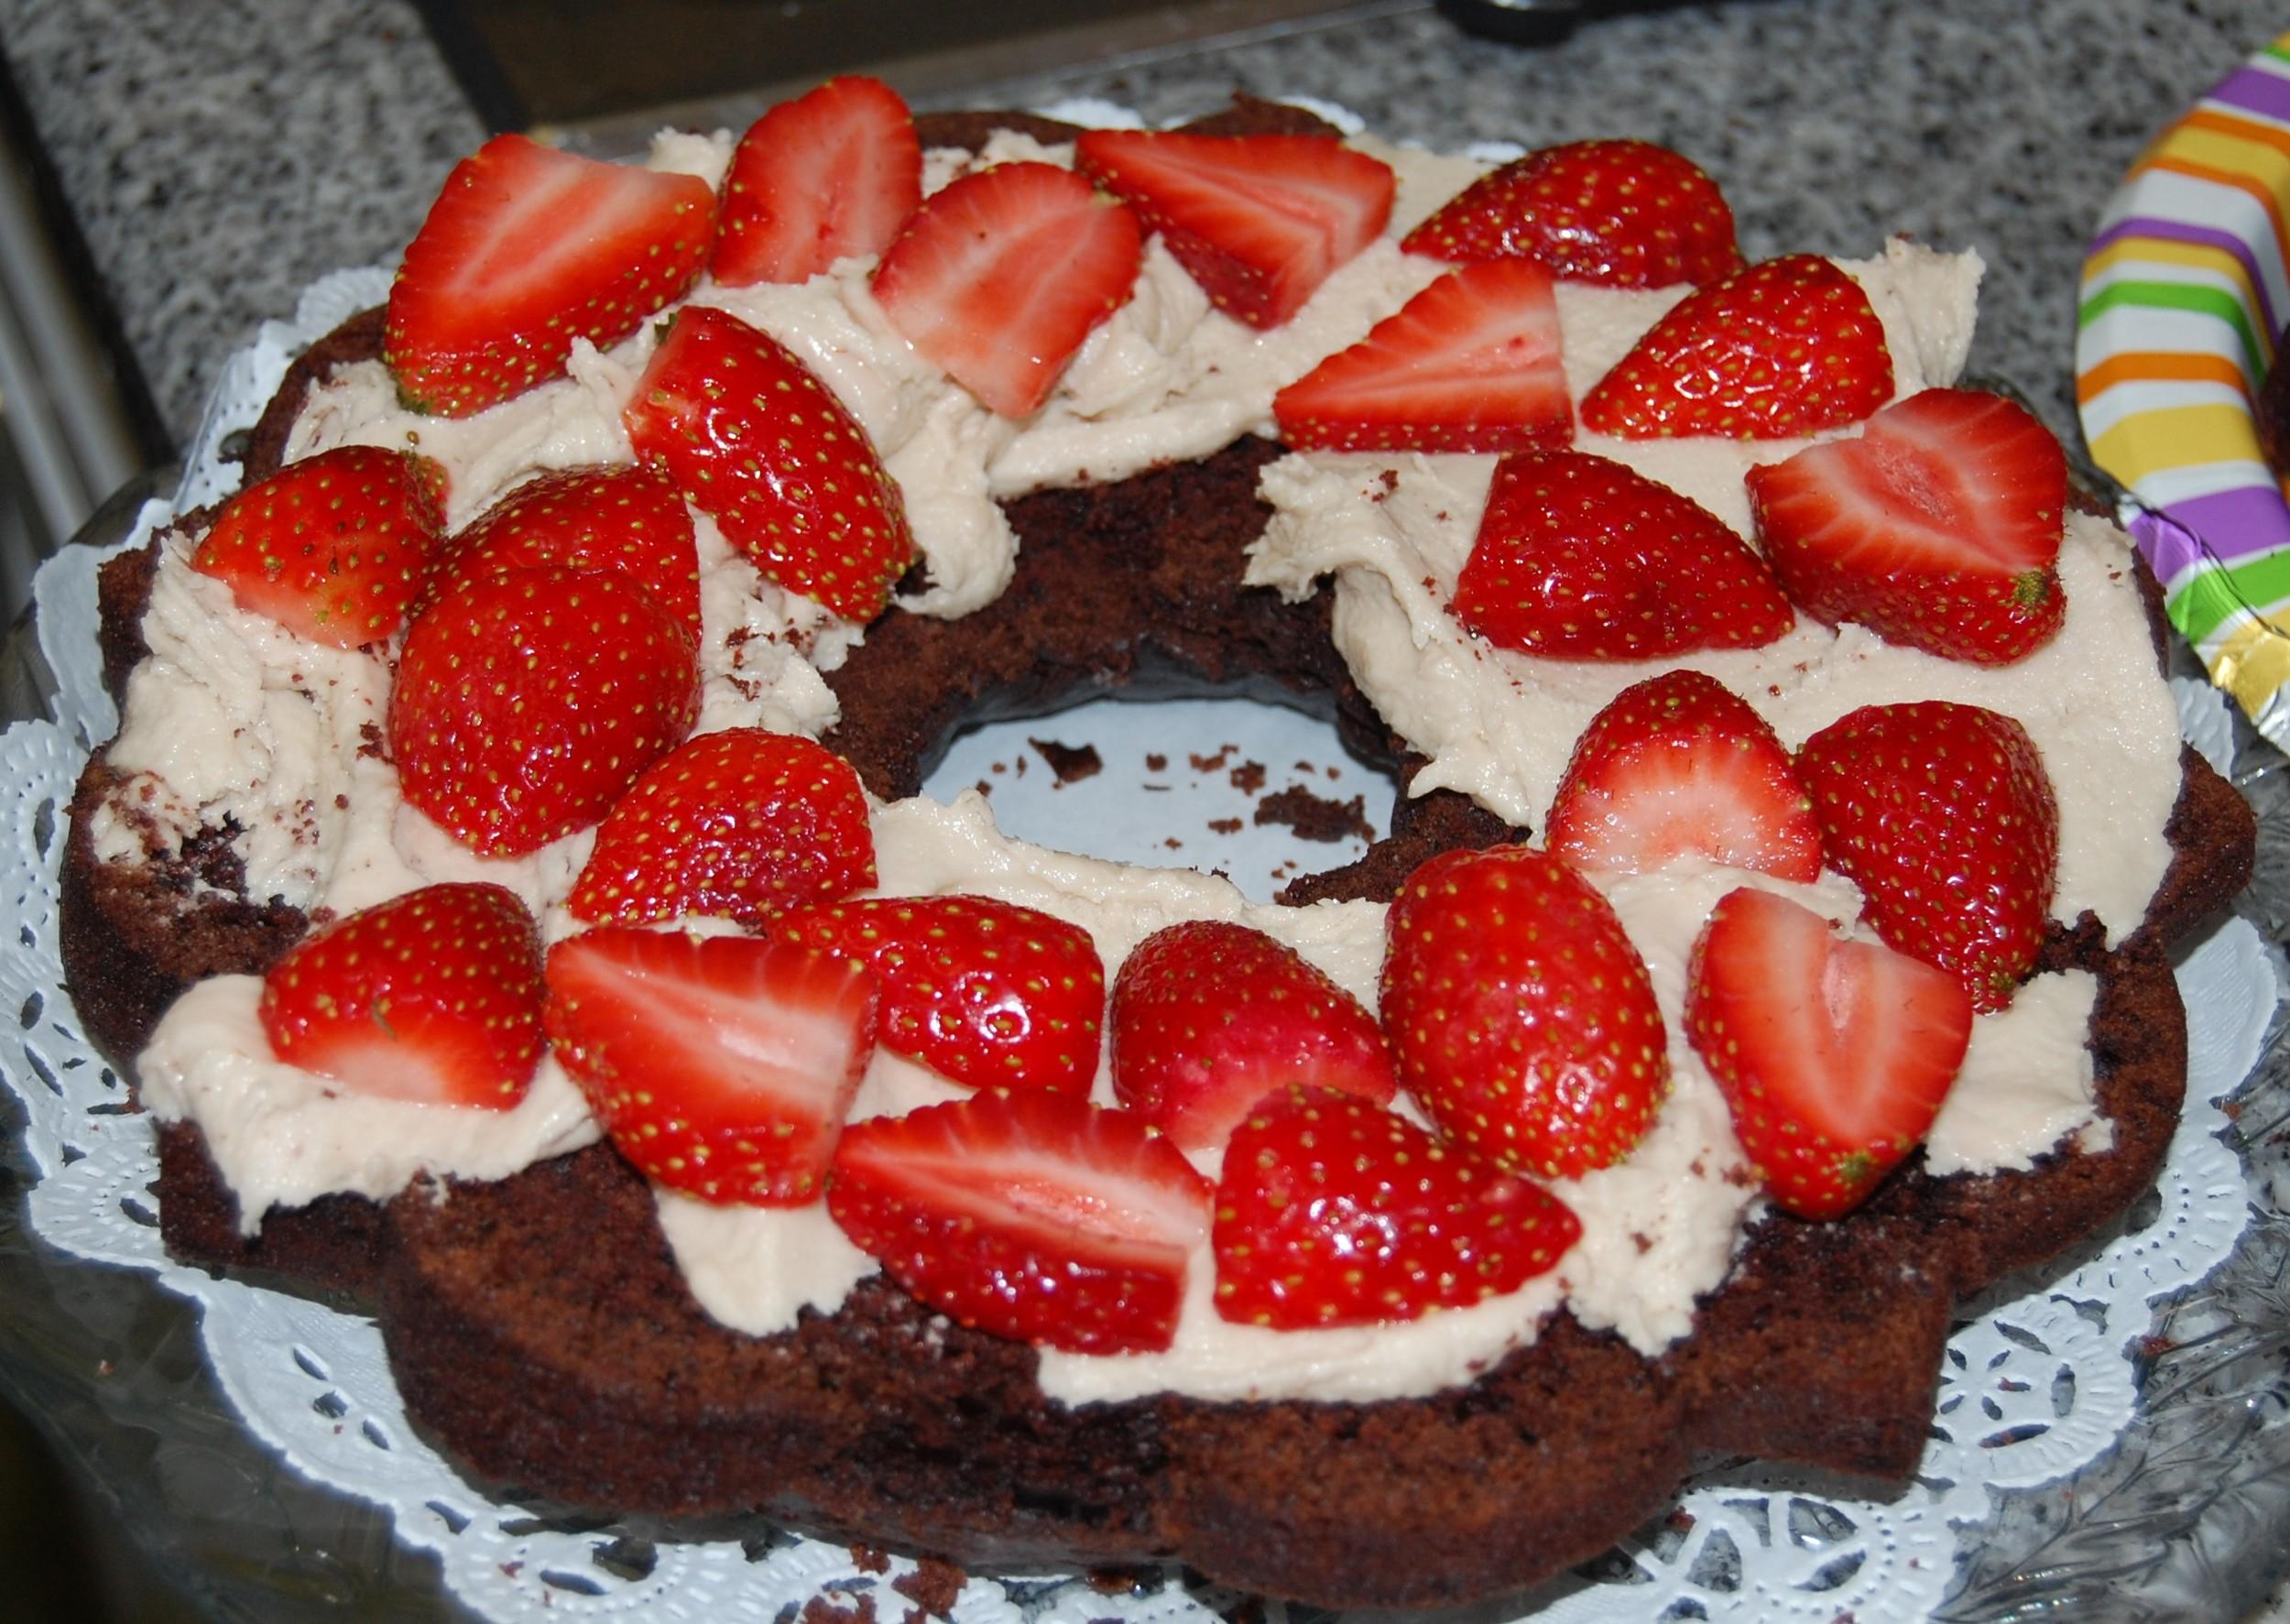 Layer 1 pf Liza's Vegan Chocolate Strawberry Shortcake